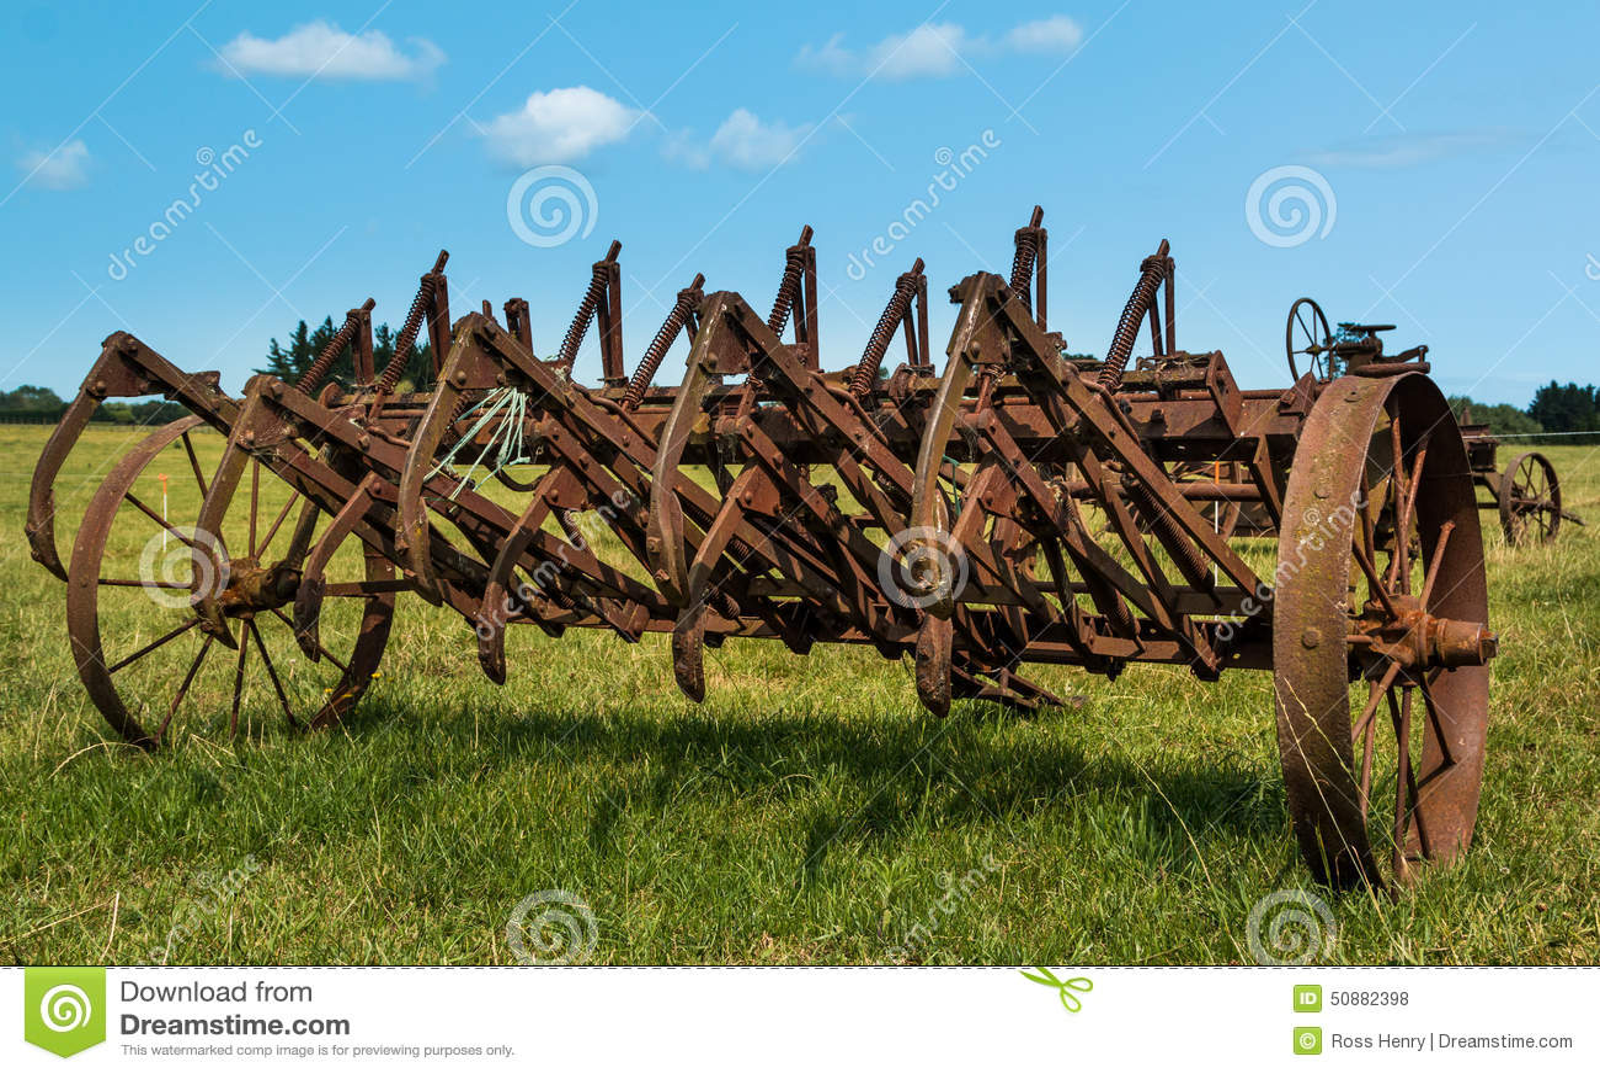 Vintage Harrow Stock Photo Image Of Soil Land Machinery